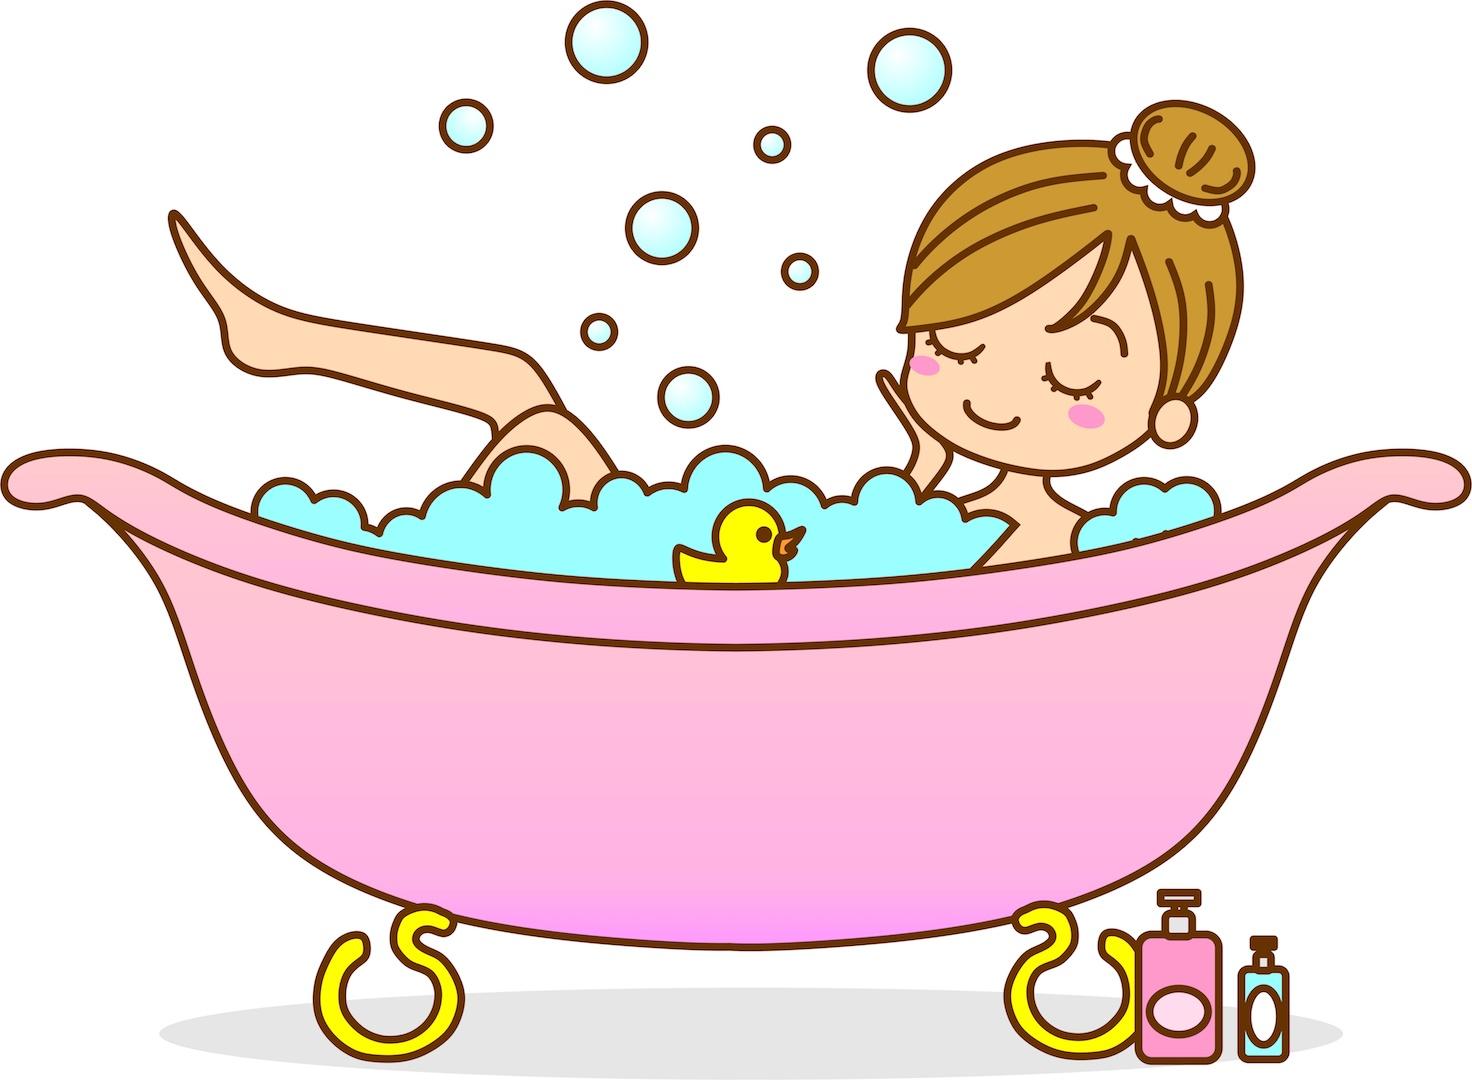 風呂 効果 朝